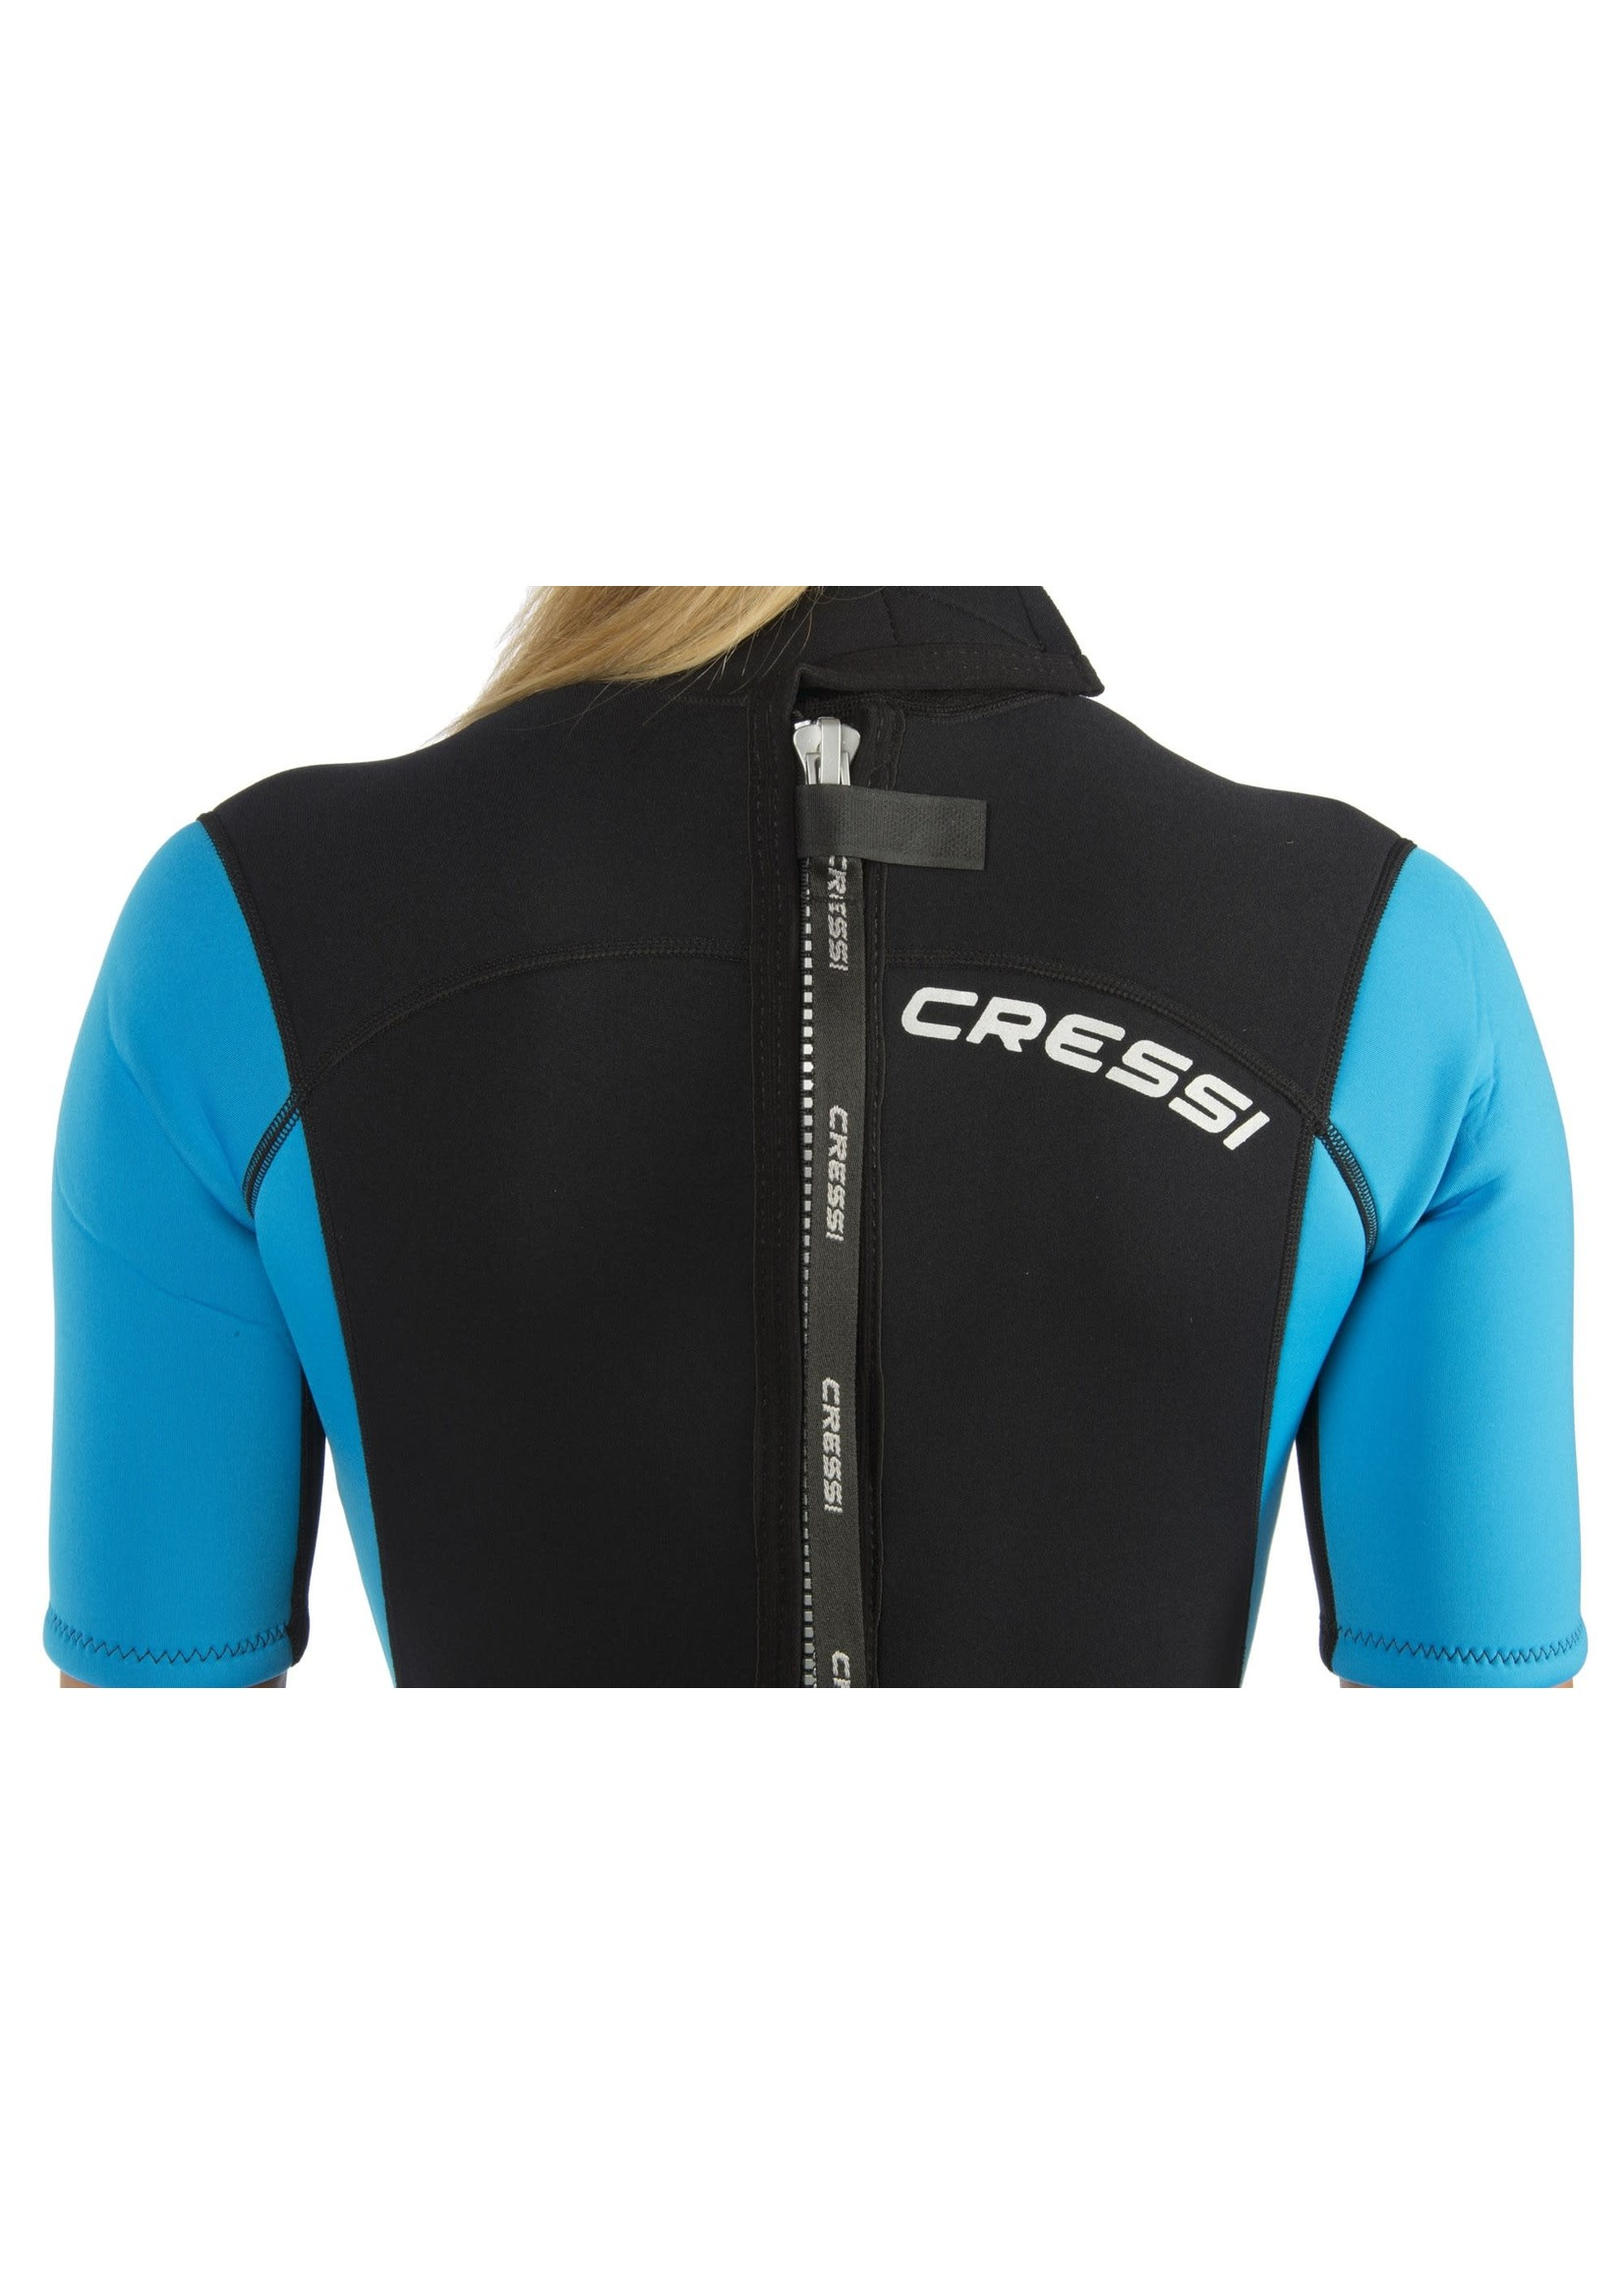 Cressi Cressi MED X Shortie 2.5mm - vrouw